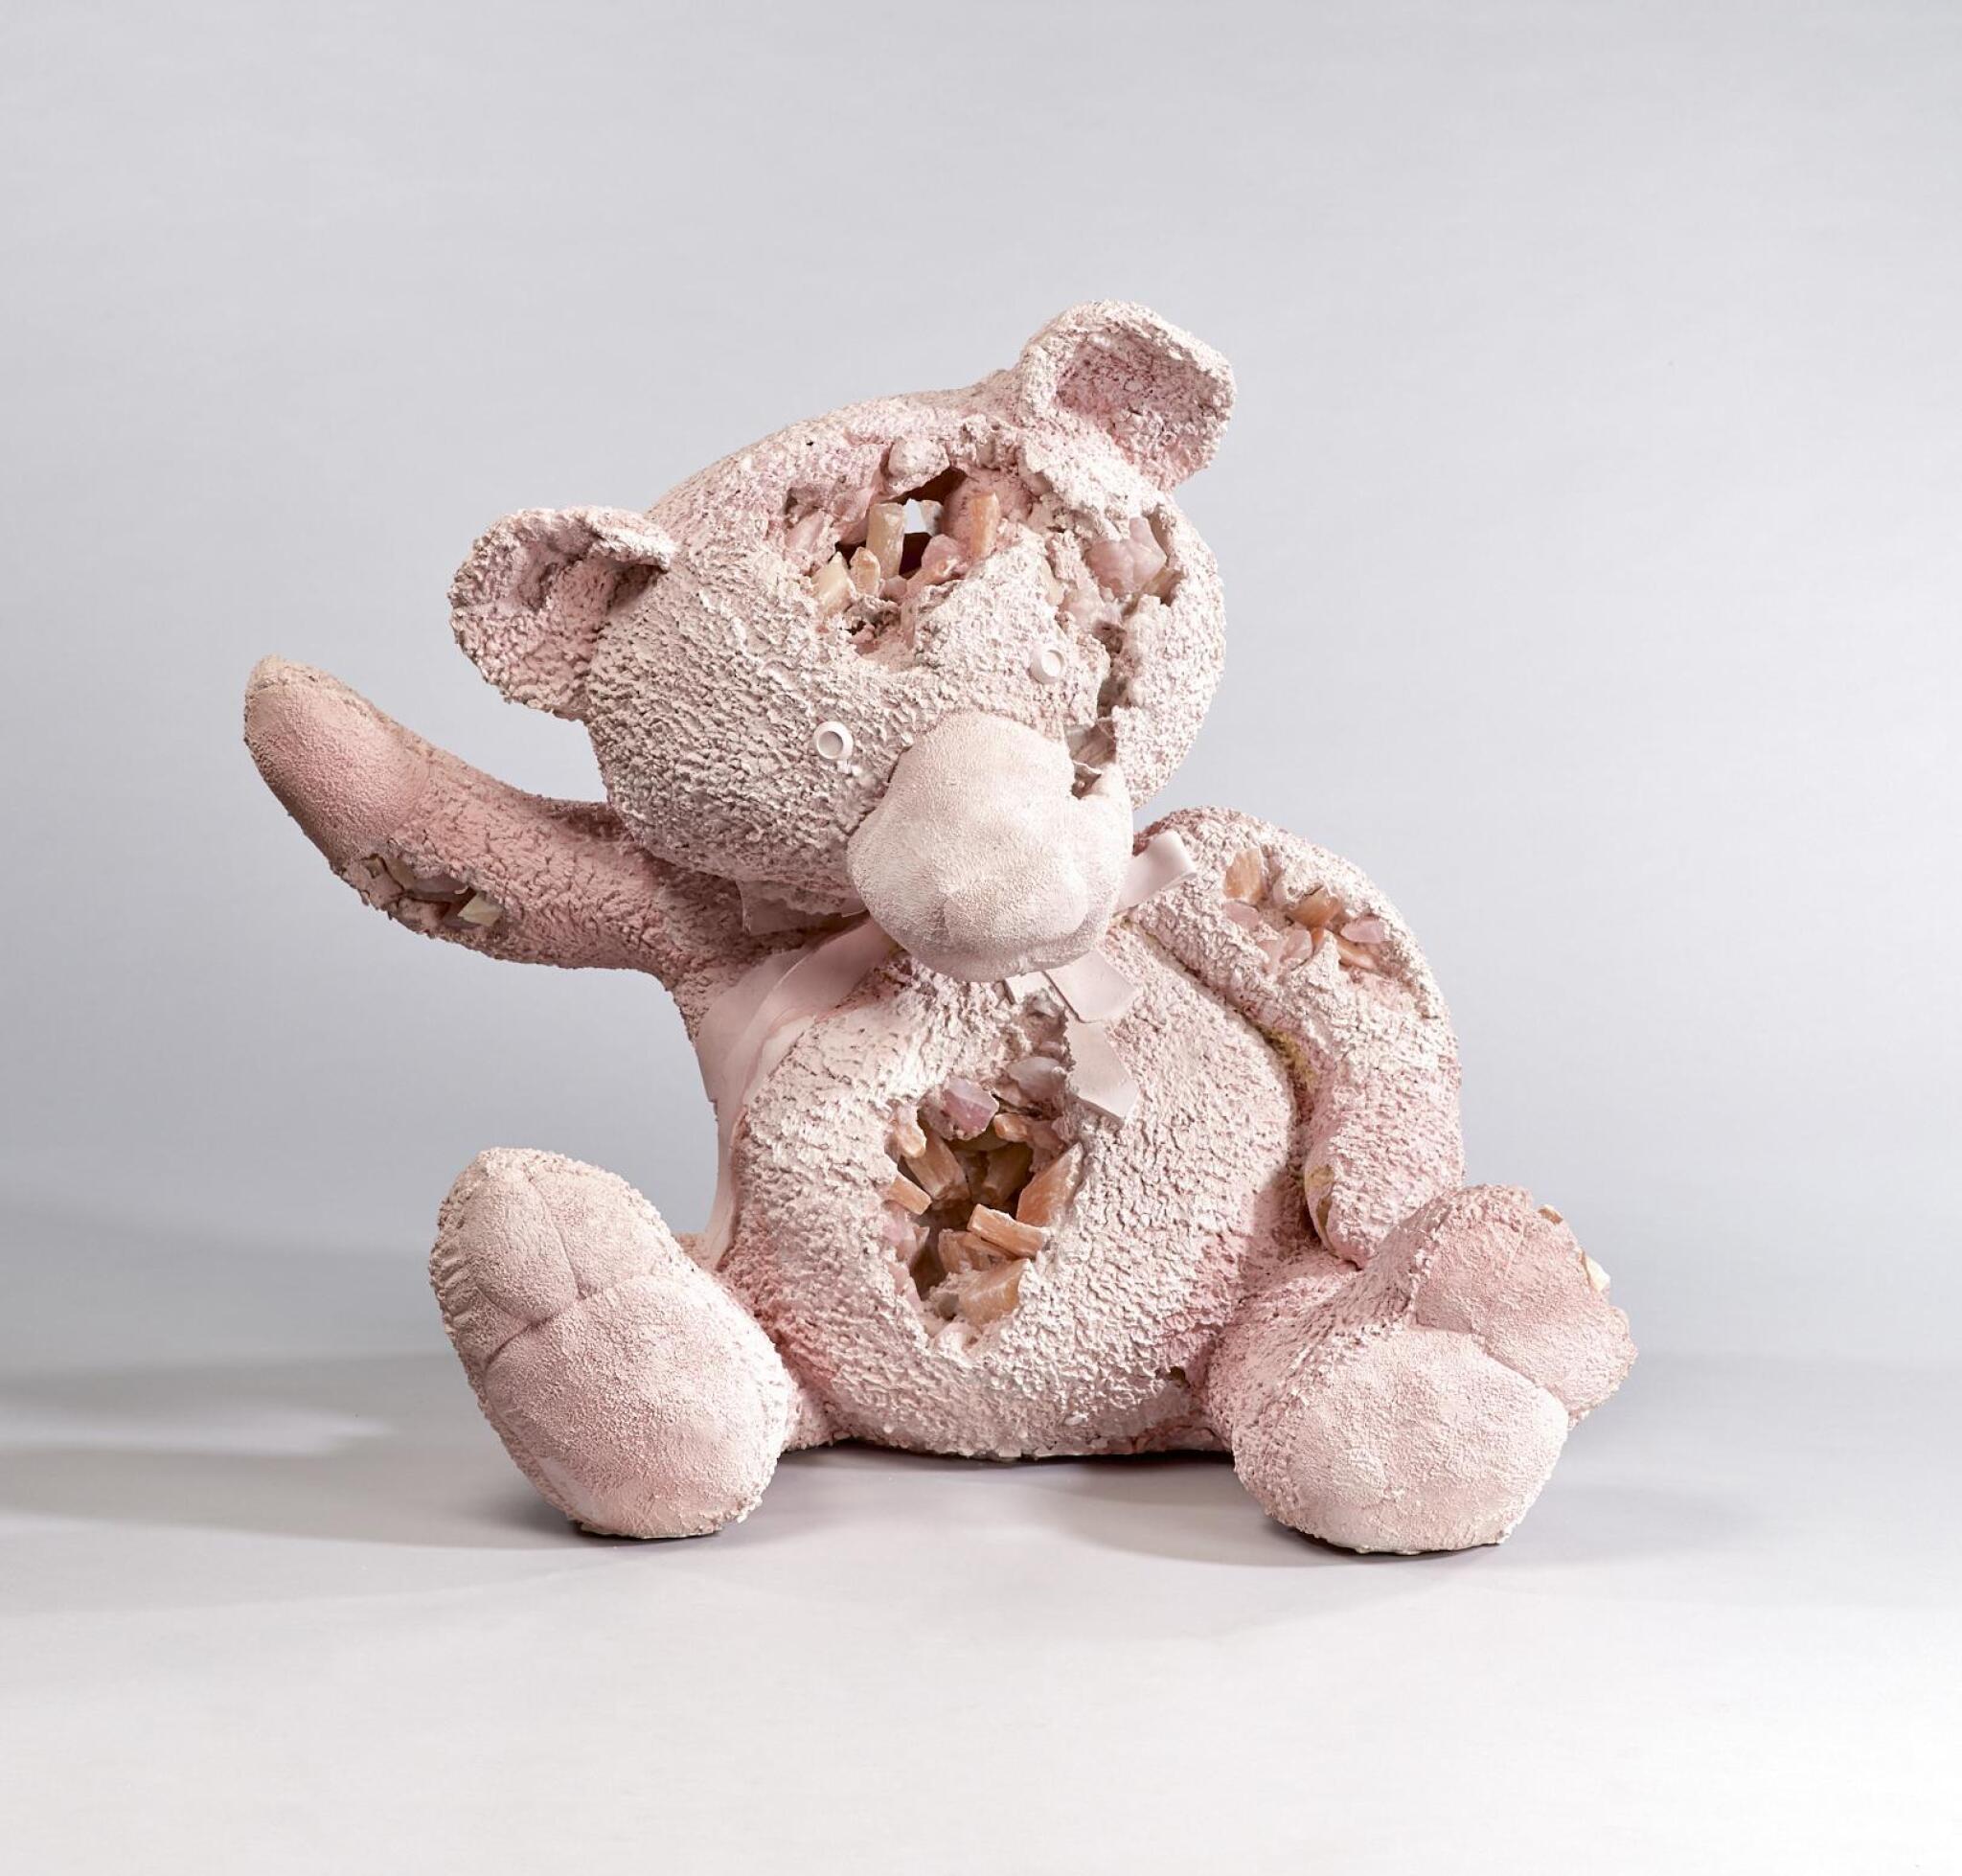 View full screen - View 1 of Lot 515. DANIEL ARSHAM 丹尼爾·阿爾軒 | PINK SELENITE & ROSE QUARTZ TEDDY BEAR 粉色亞硒酸鹽和玫瑰石英泰迪熊.